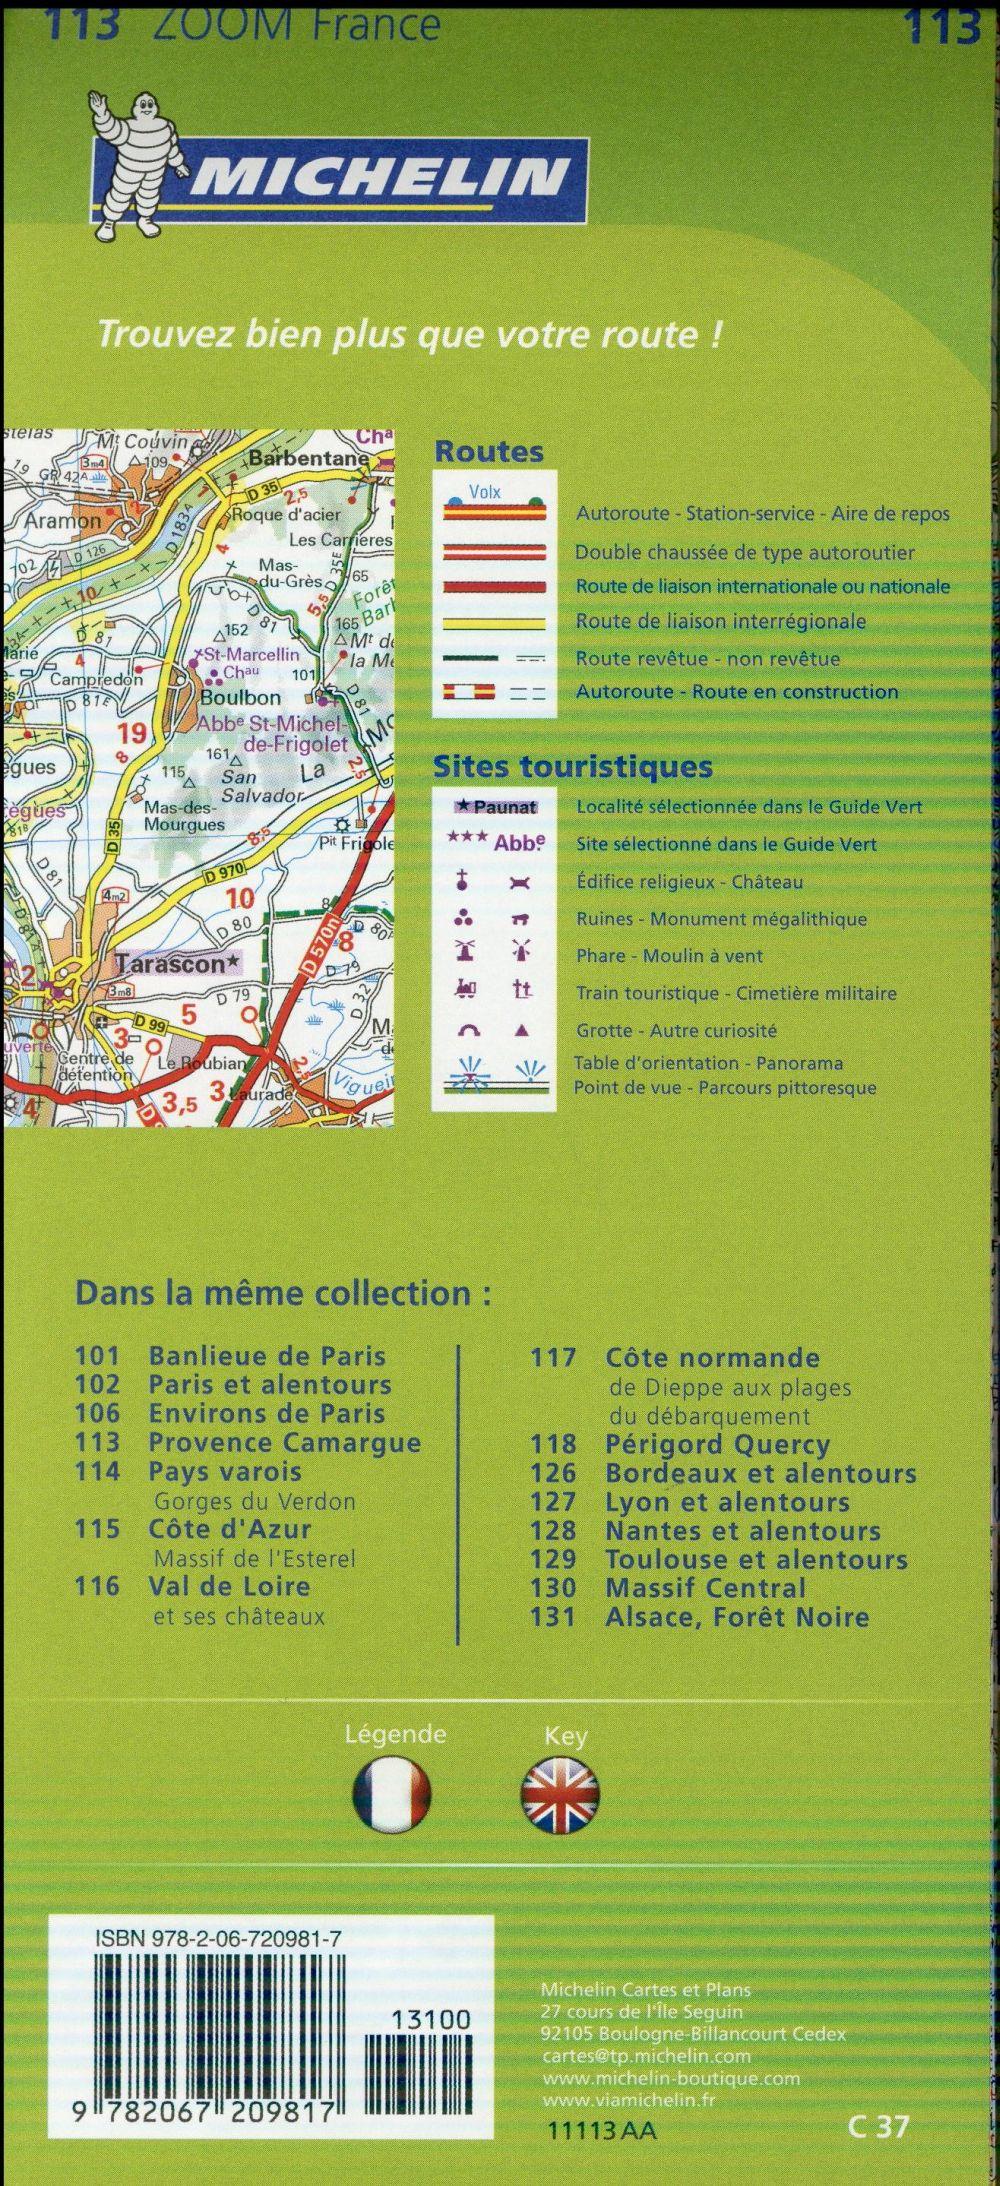 Provence, Camargue